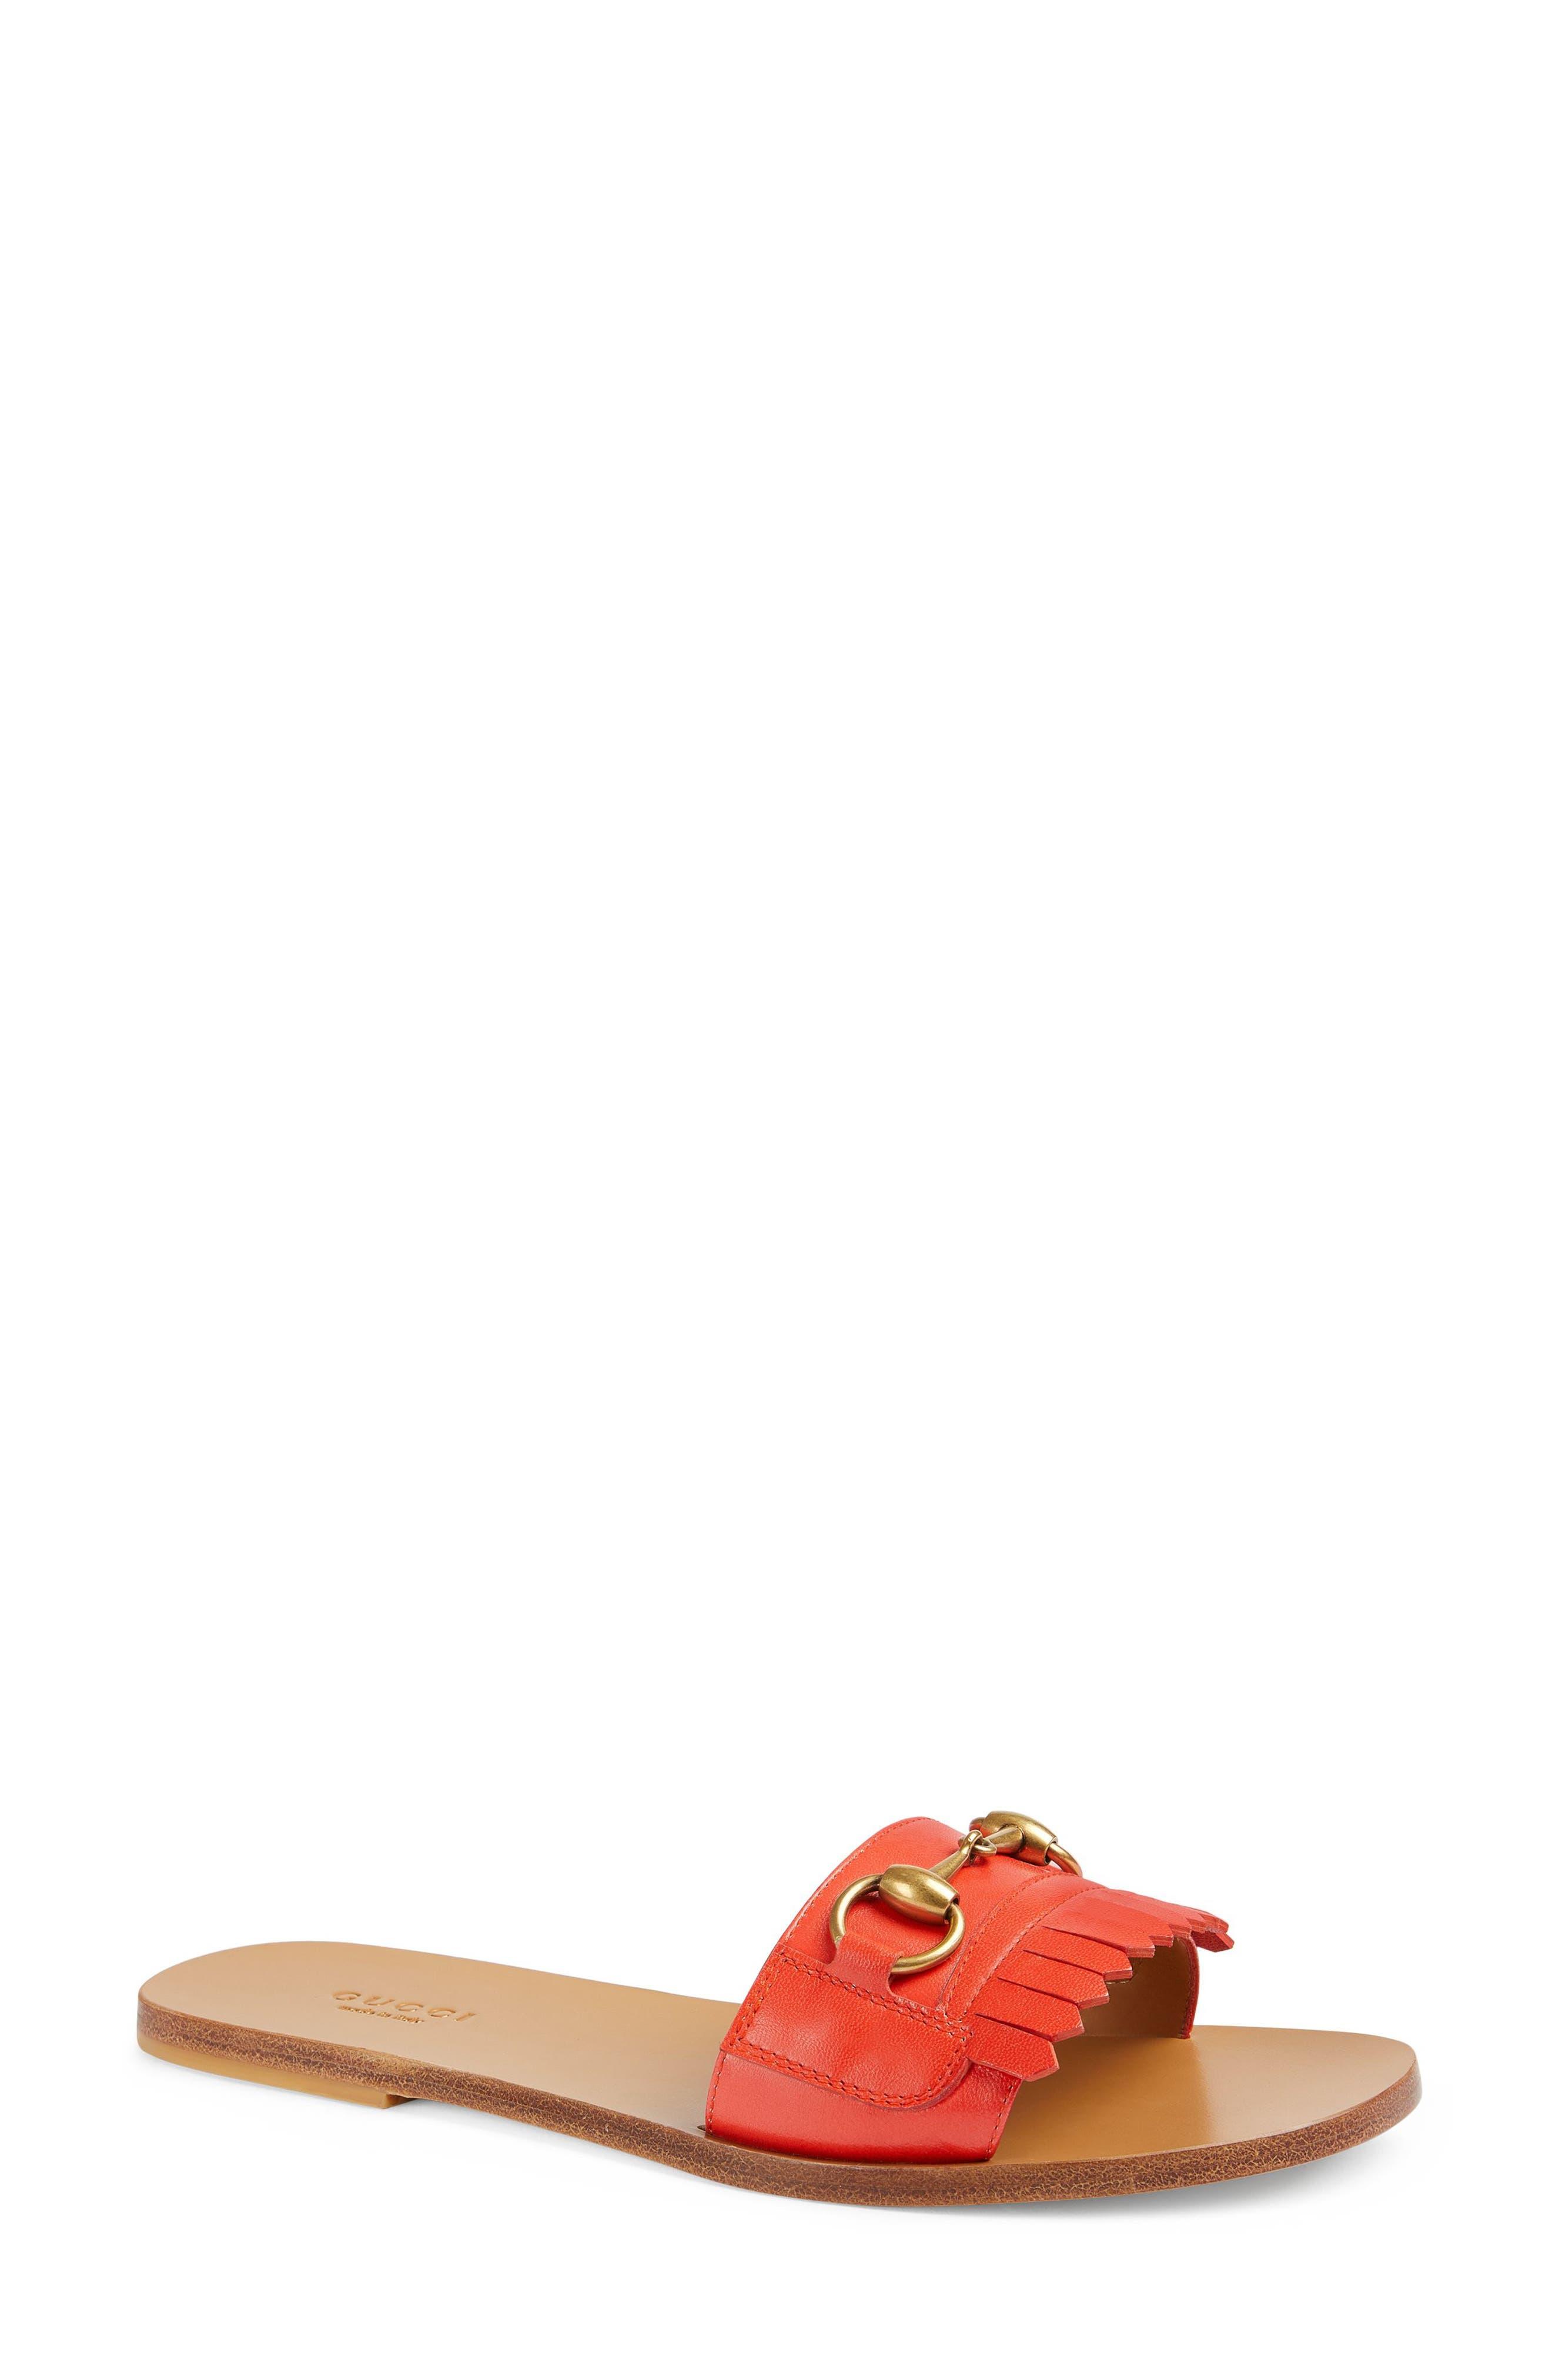 Varadero Slide Sandal,                         Main,                         color, Orange